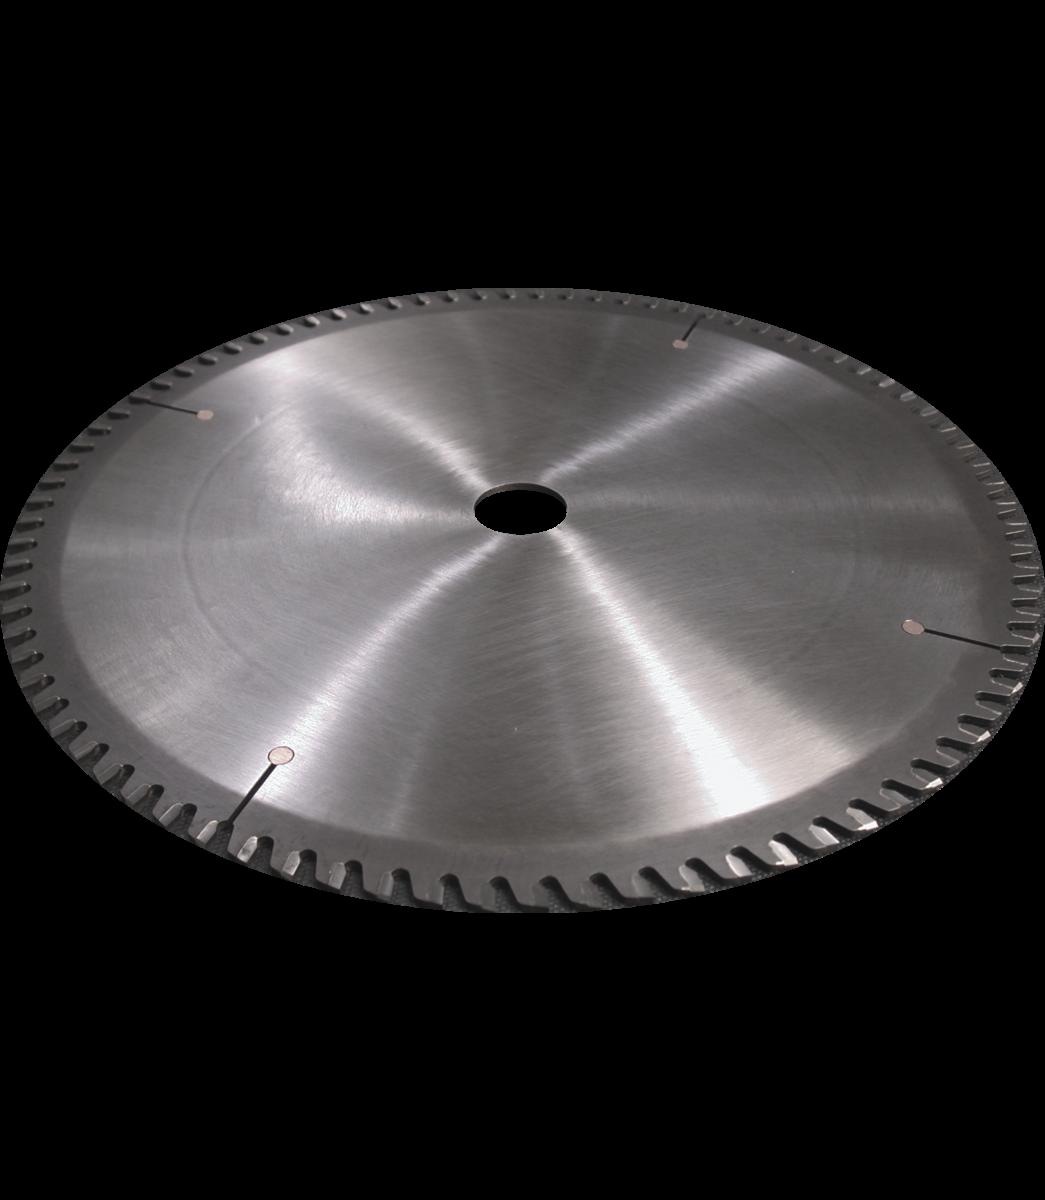 Ferrous Circular Saw Blade 350mm x 32mm x 2.5mm x 54T for J-FK350-2/4K